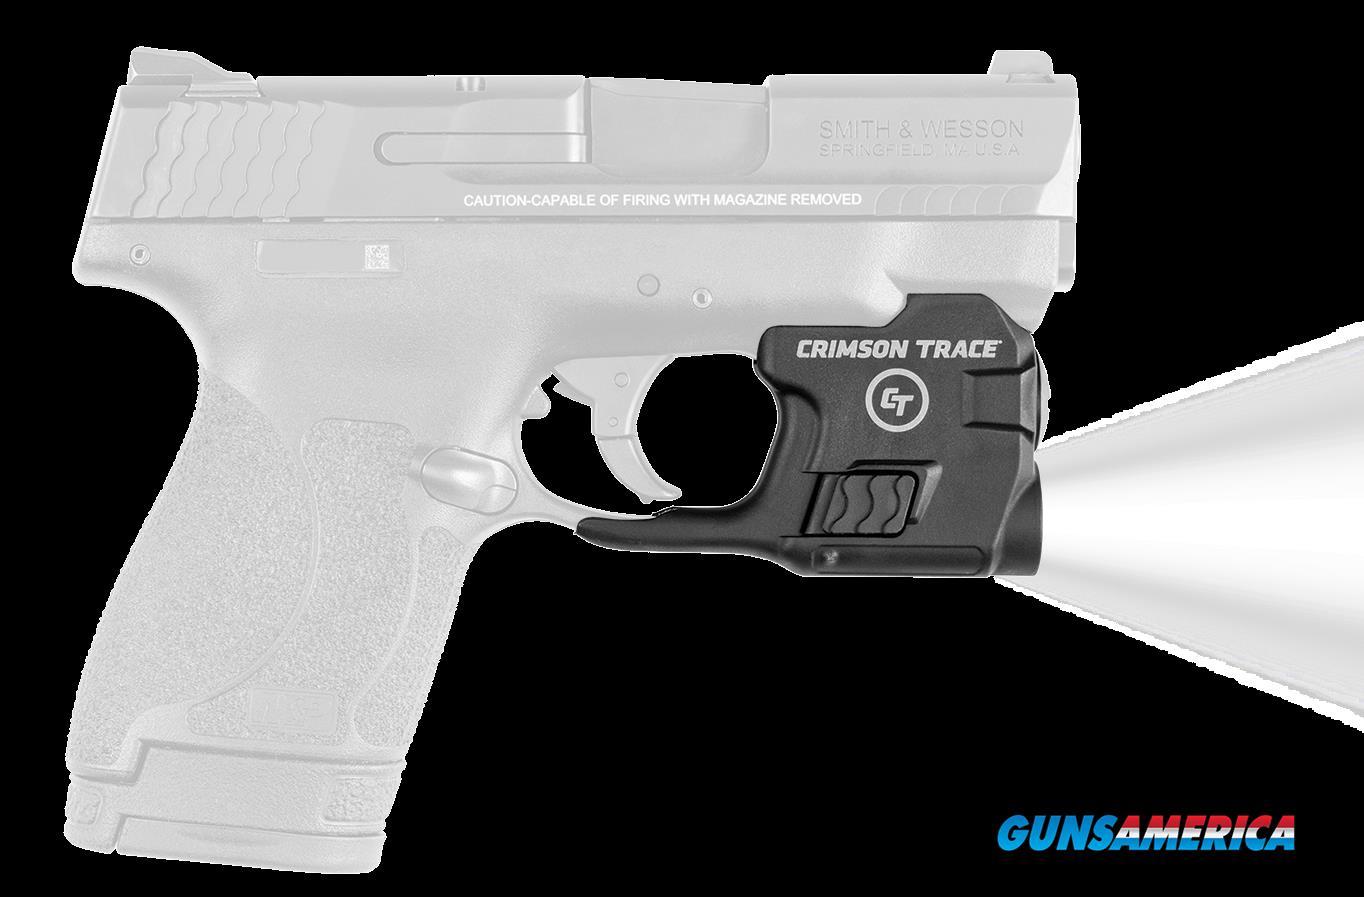 Crimson Trace Lightguard, Crim Ltg770  Lightguard Sw Shield 9-40  Guns > Pistols > 1911 Pistol Copies (non-Colt)